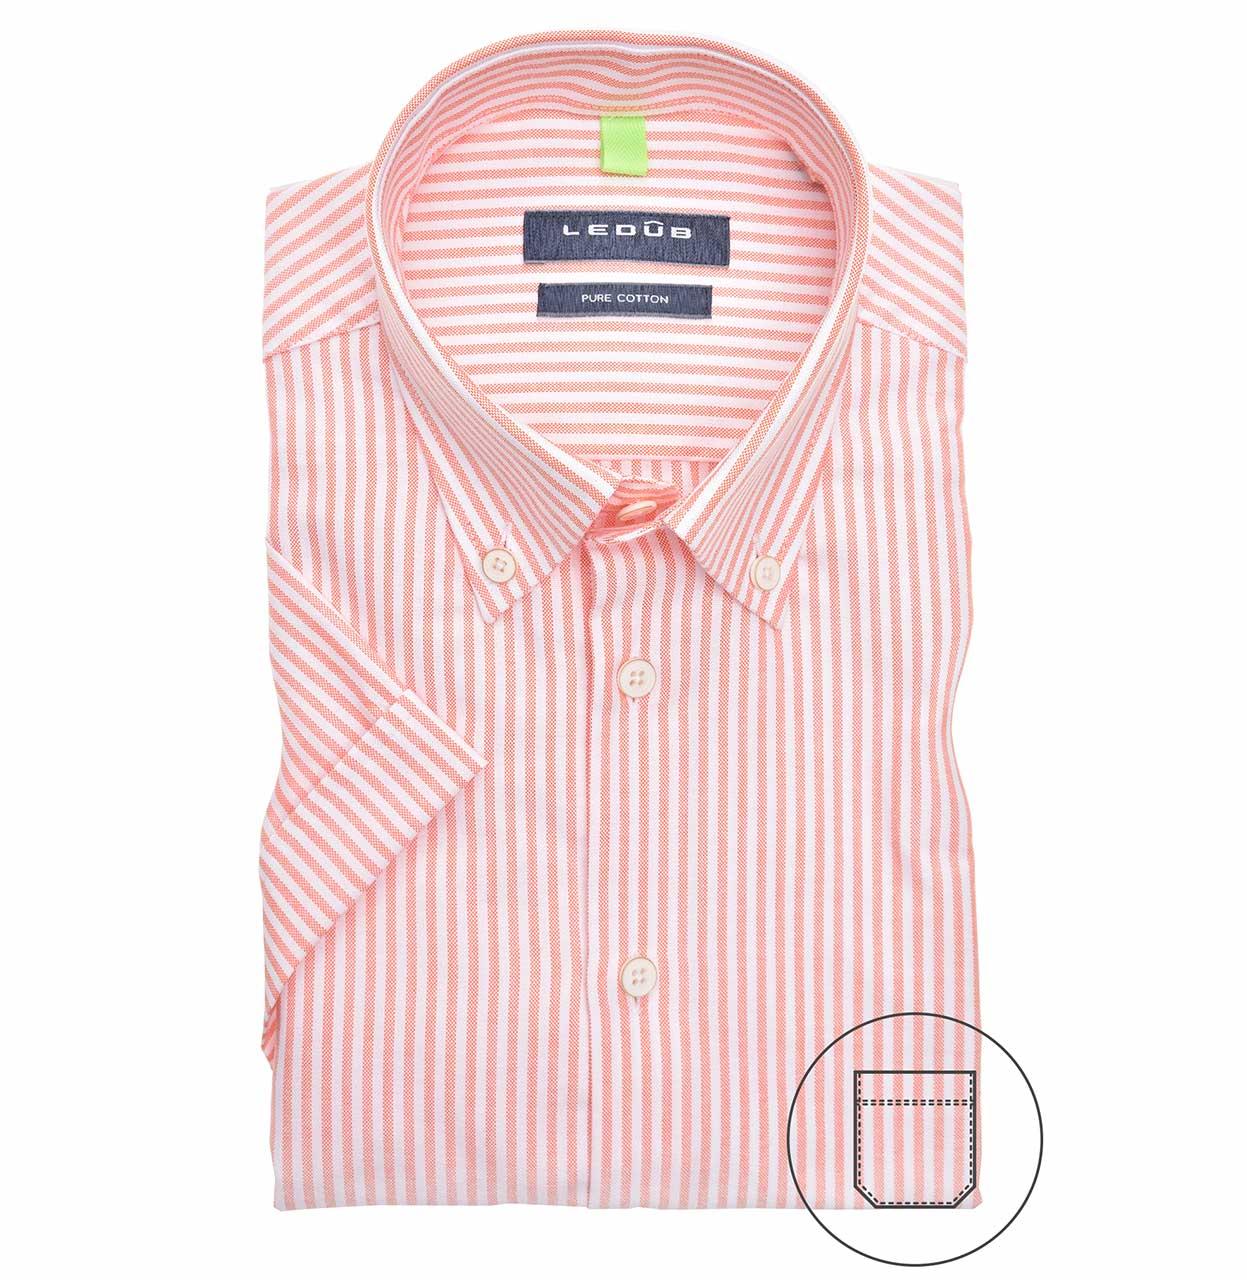 Ledub Shirt 0140053 850540 Middenoranje 850 Midden 0140053 oranje Maat 39